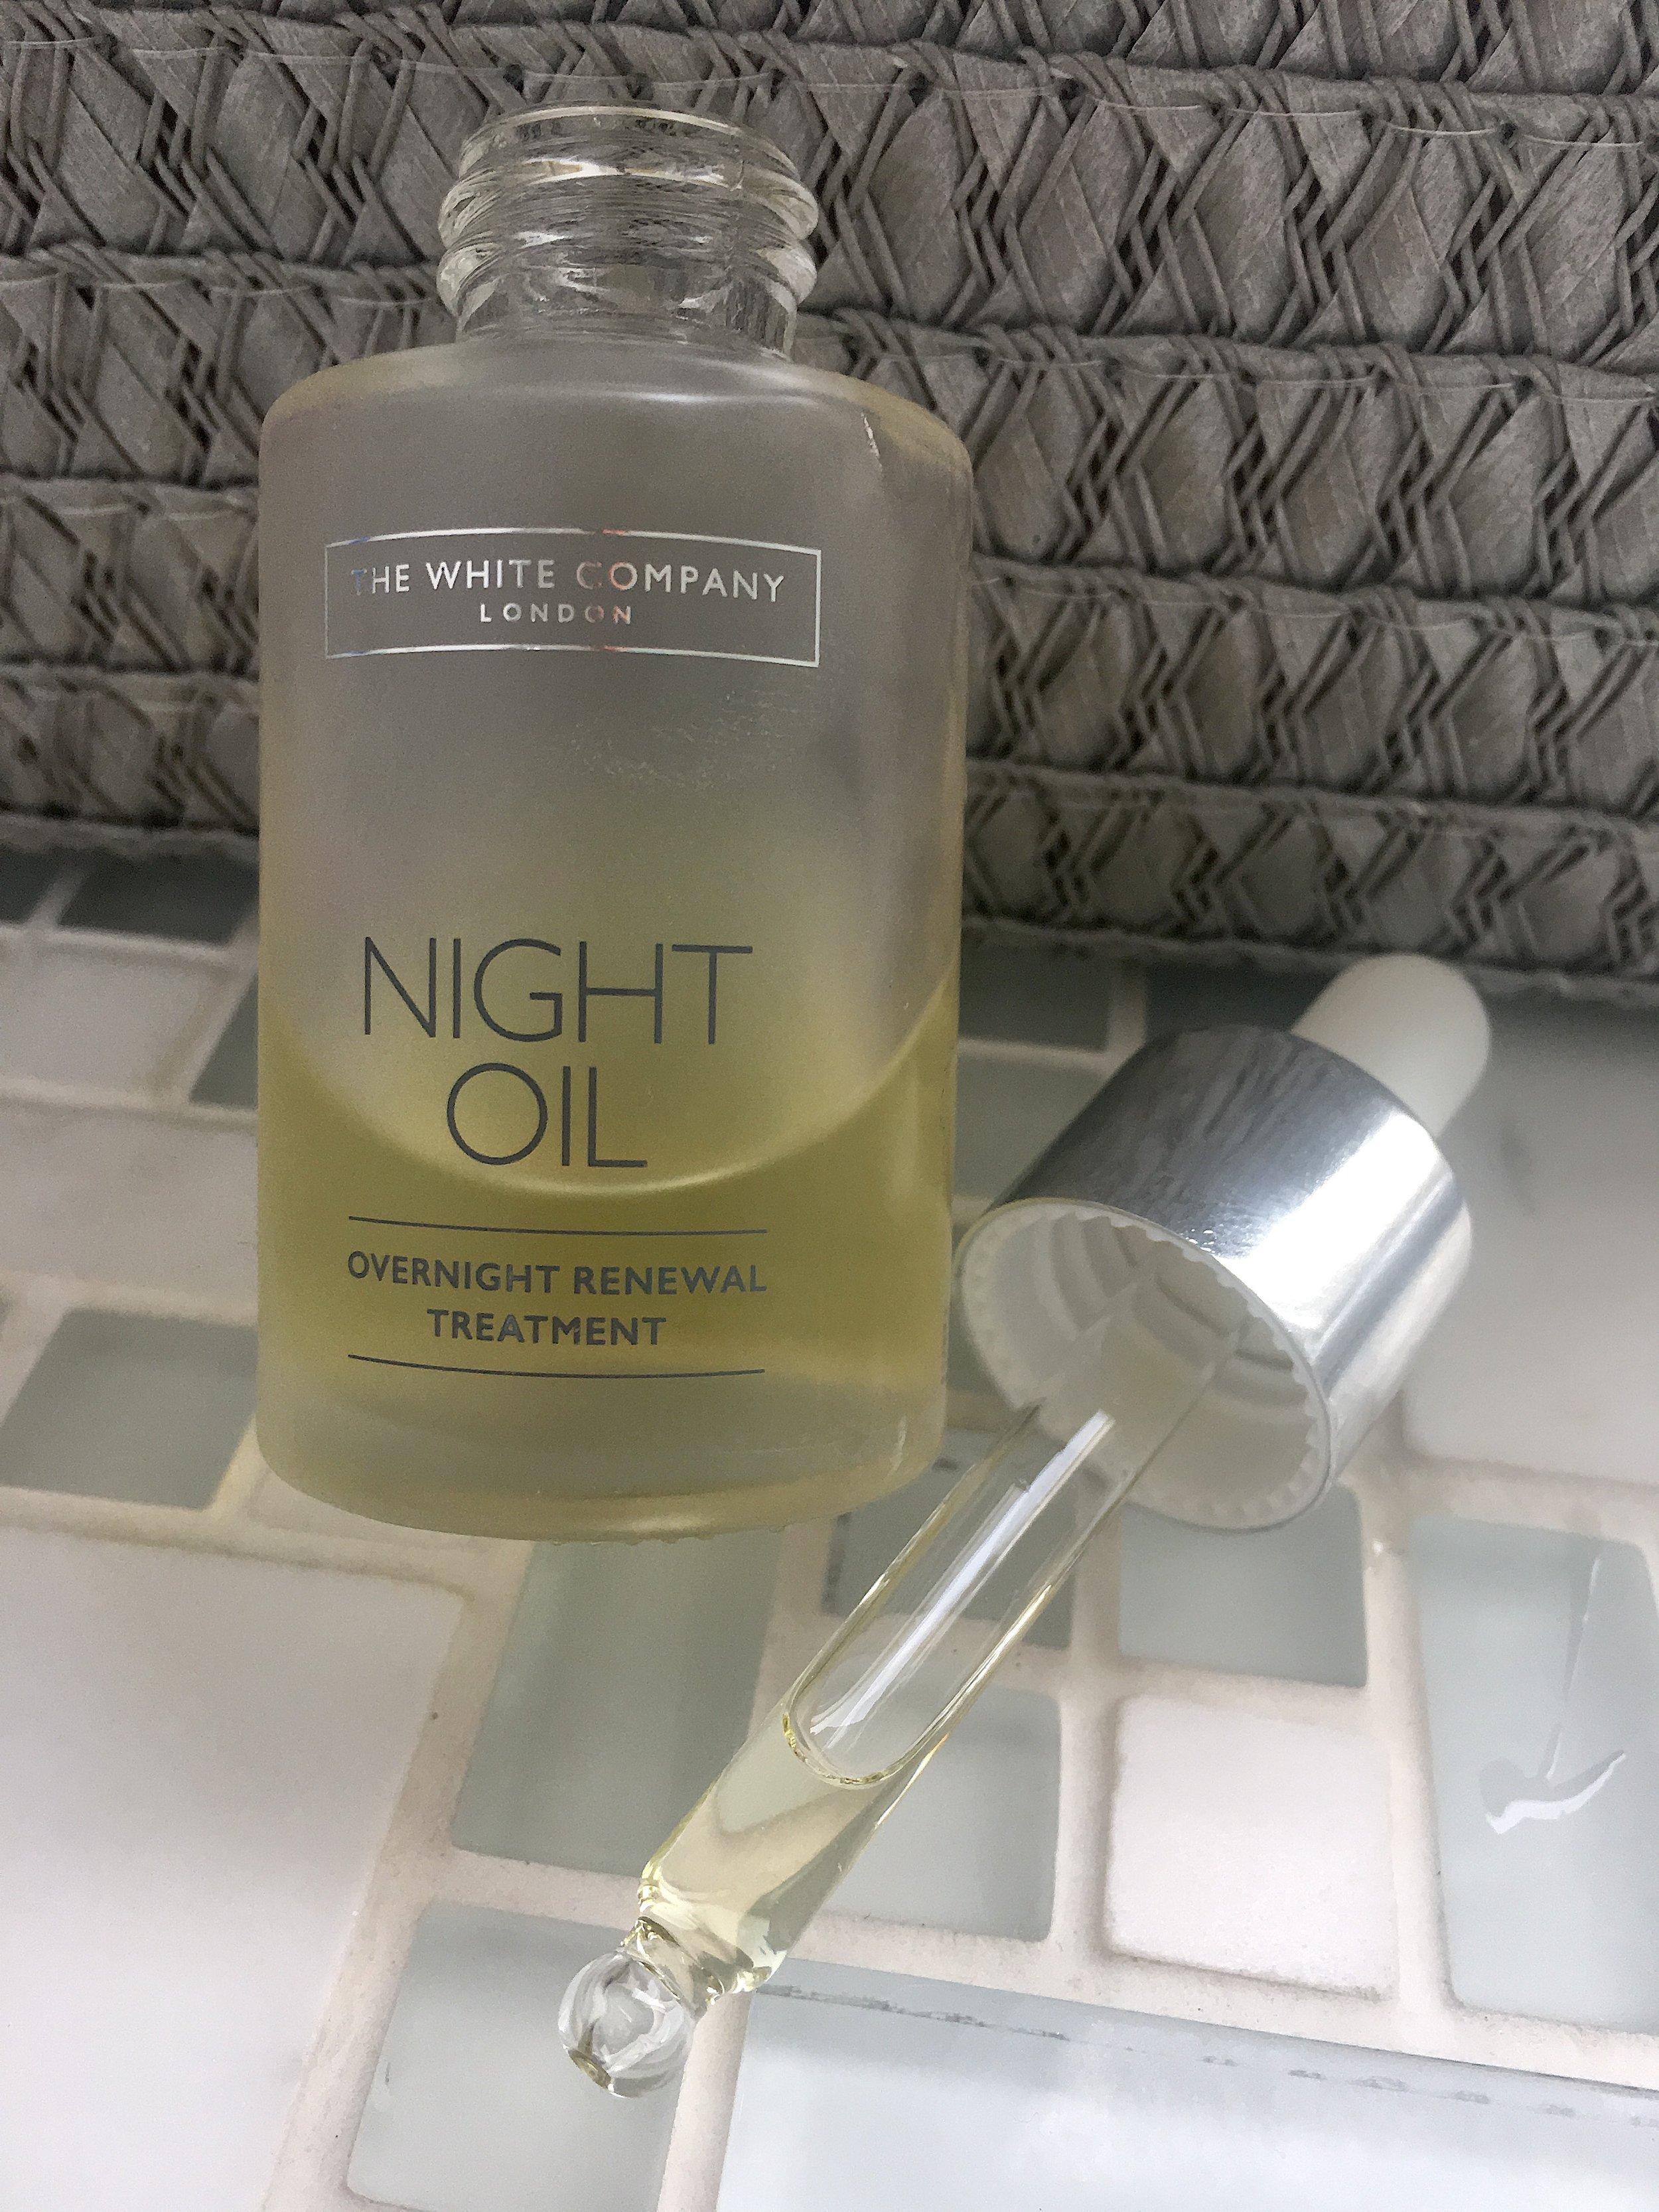 White Company Night Oil (open).JPG